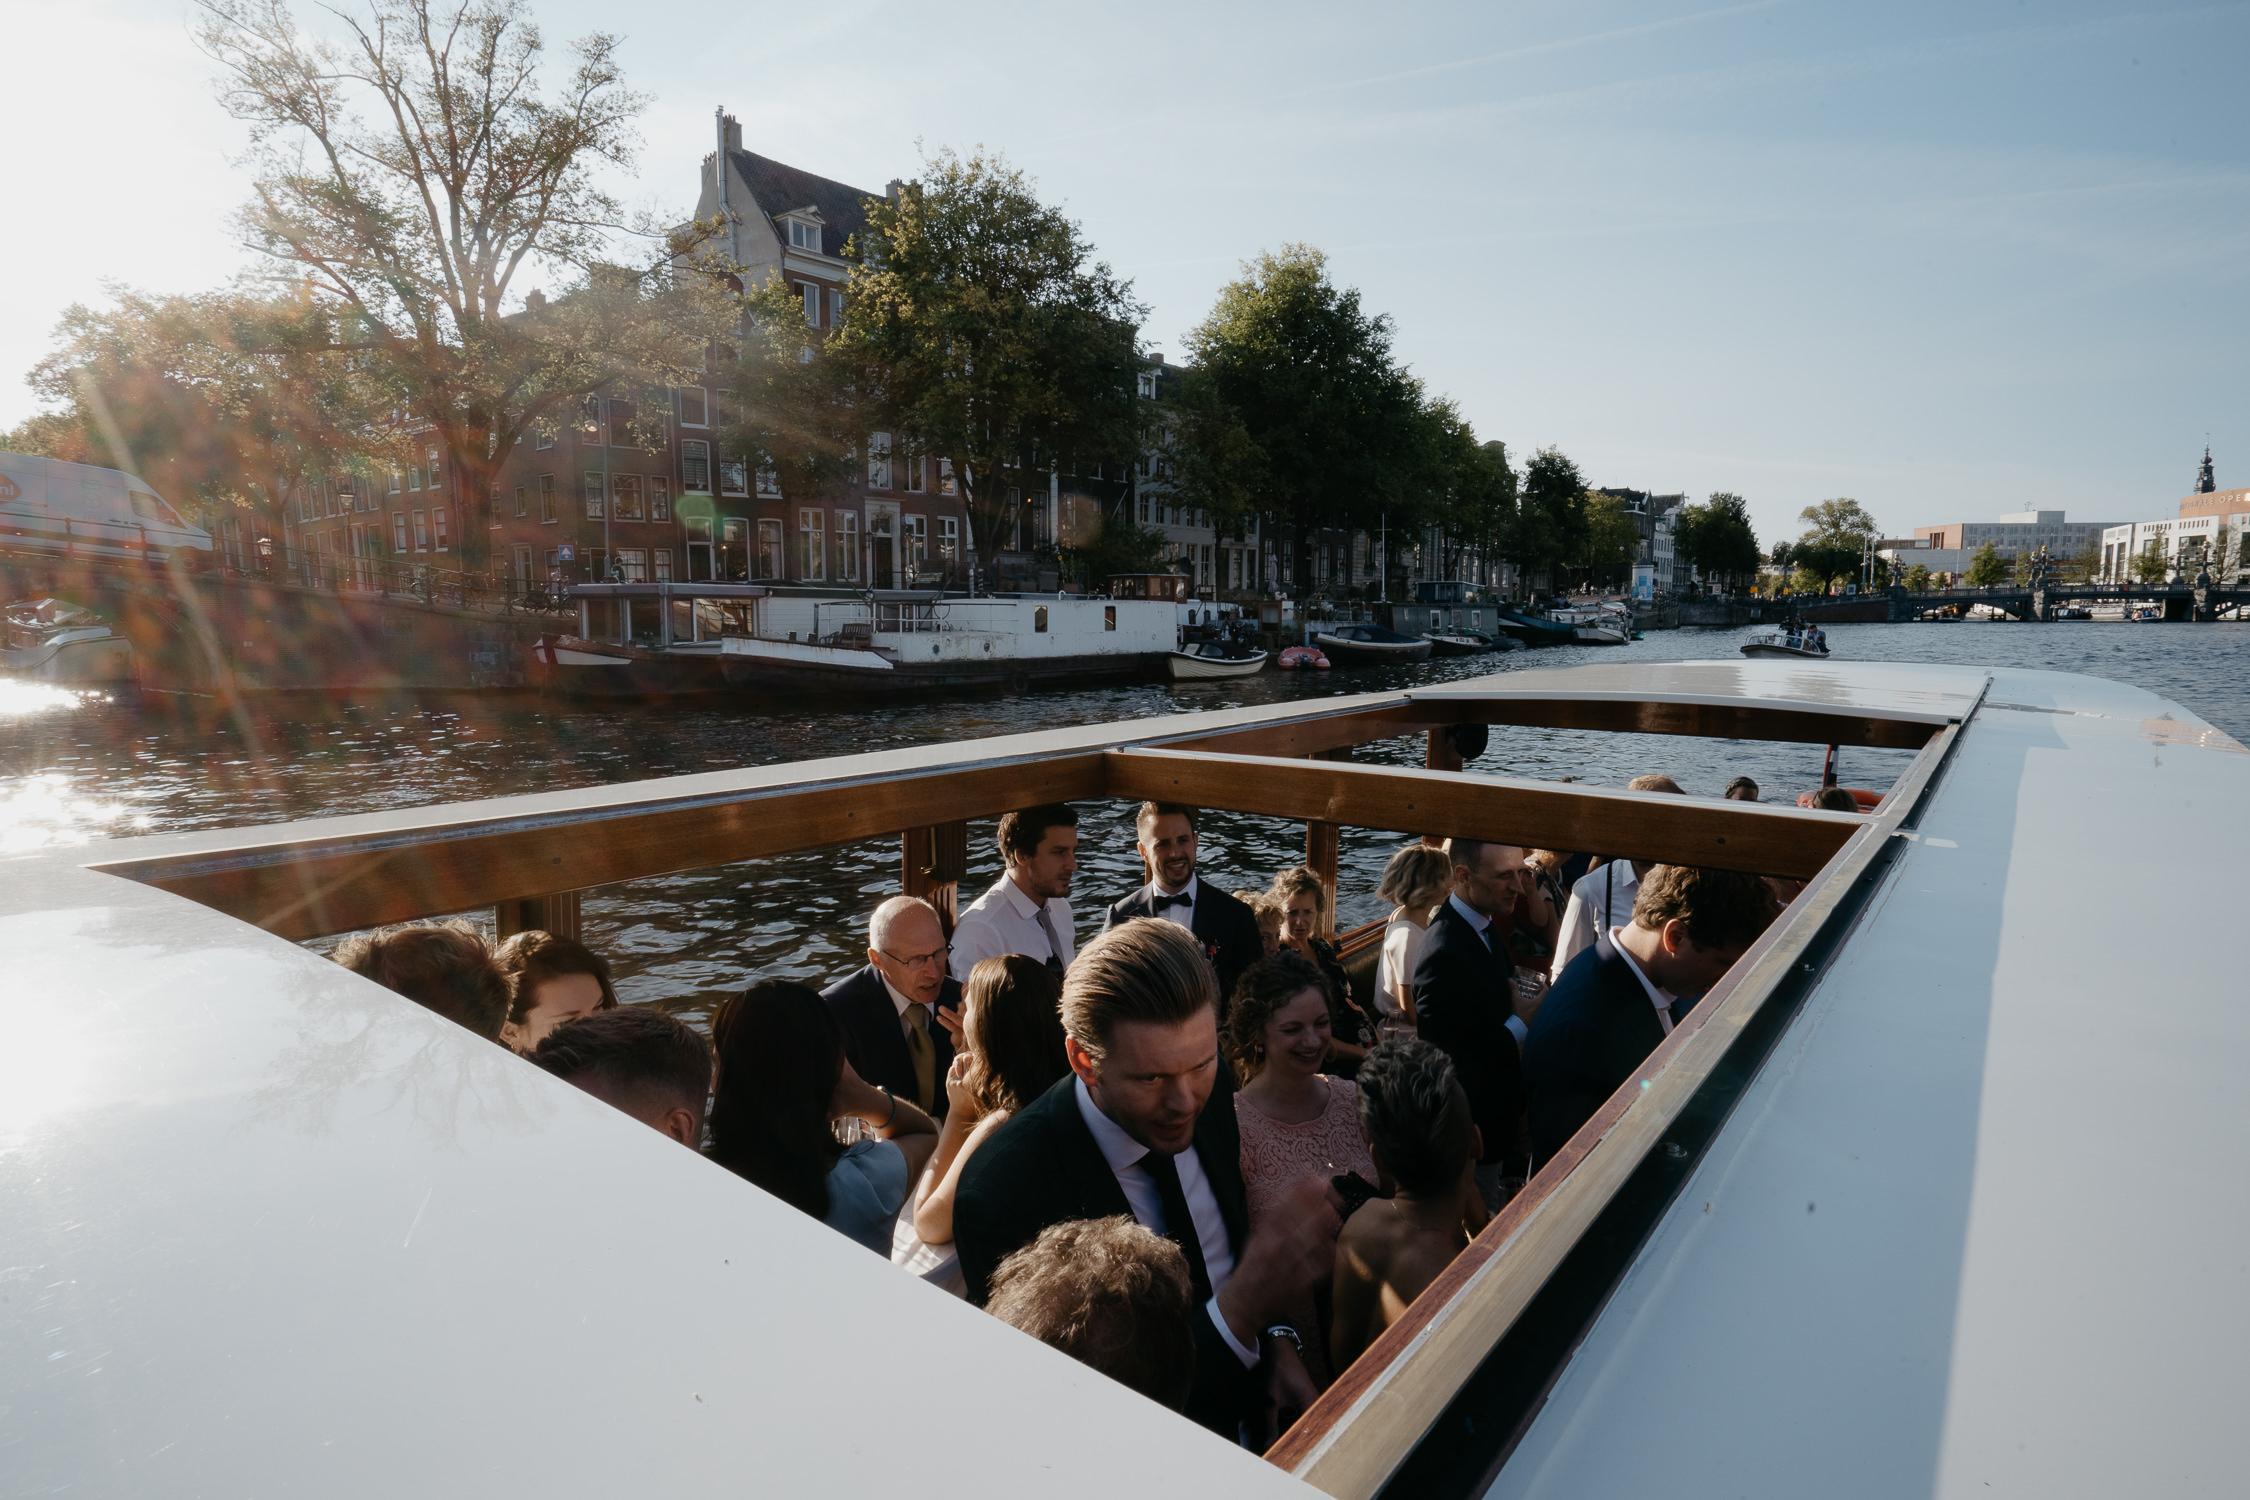 Photograph of wedding boat trip around amsterdam